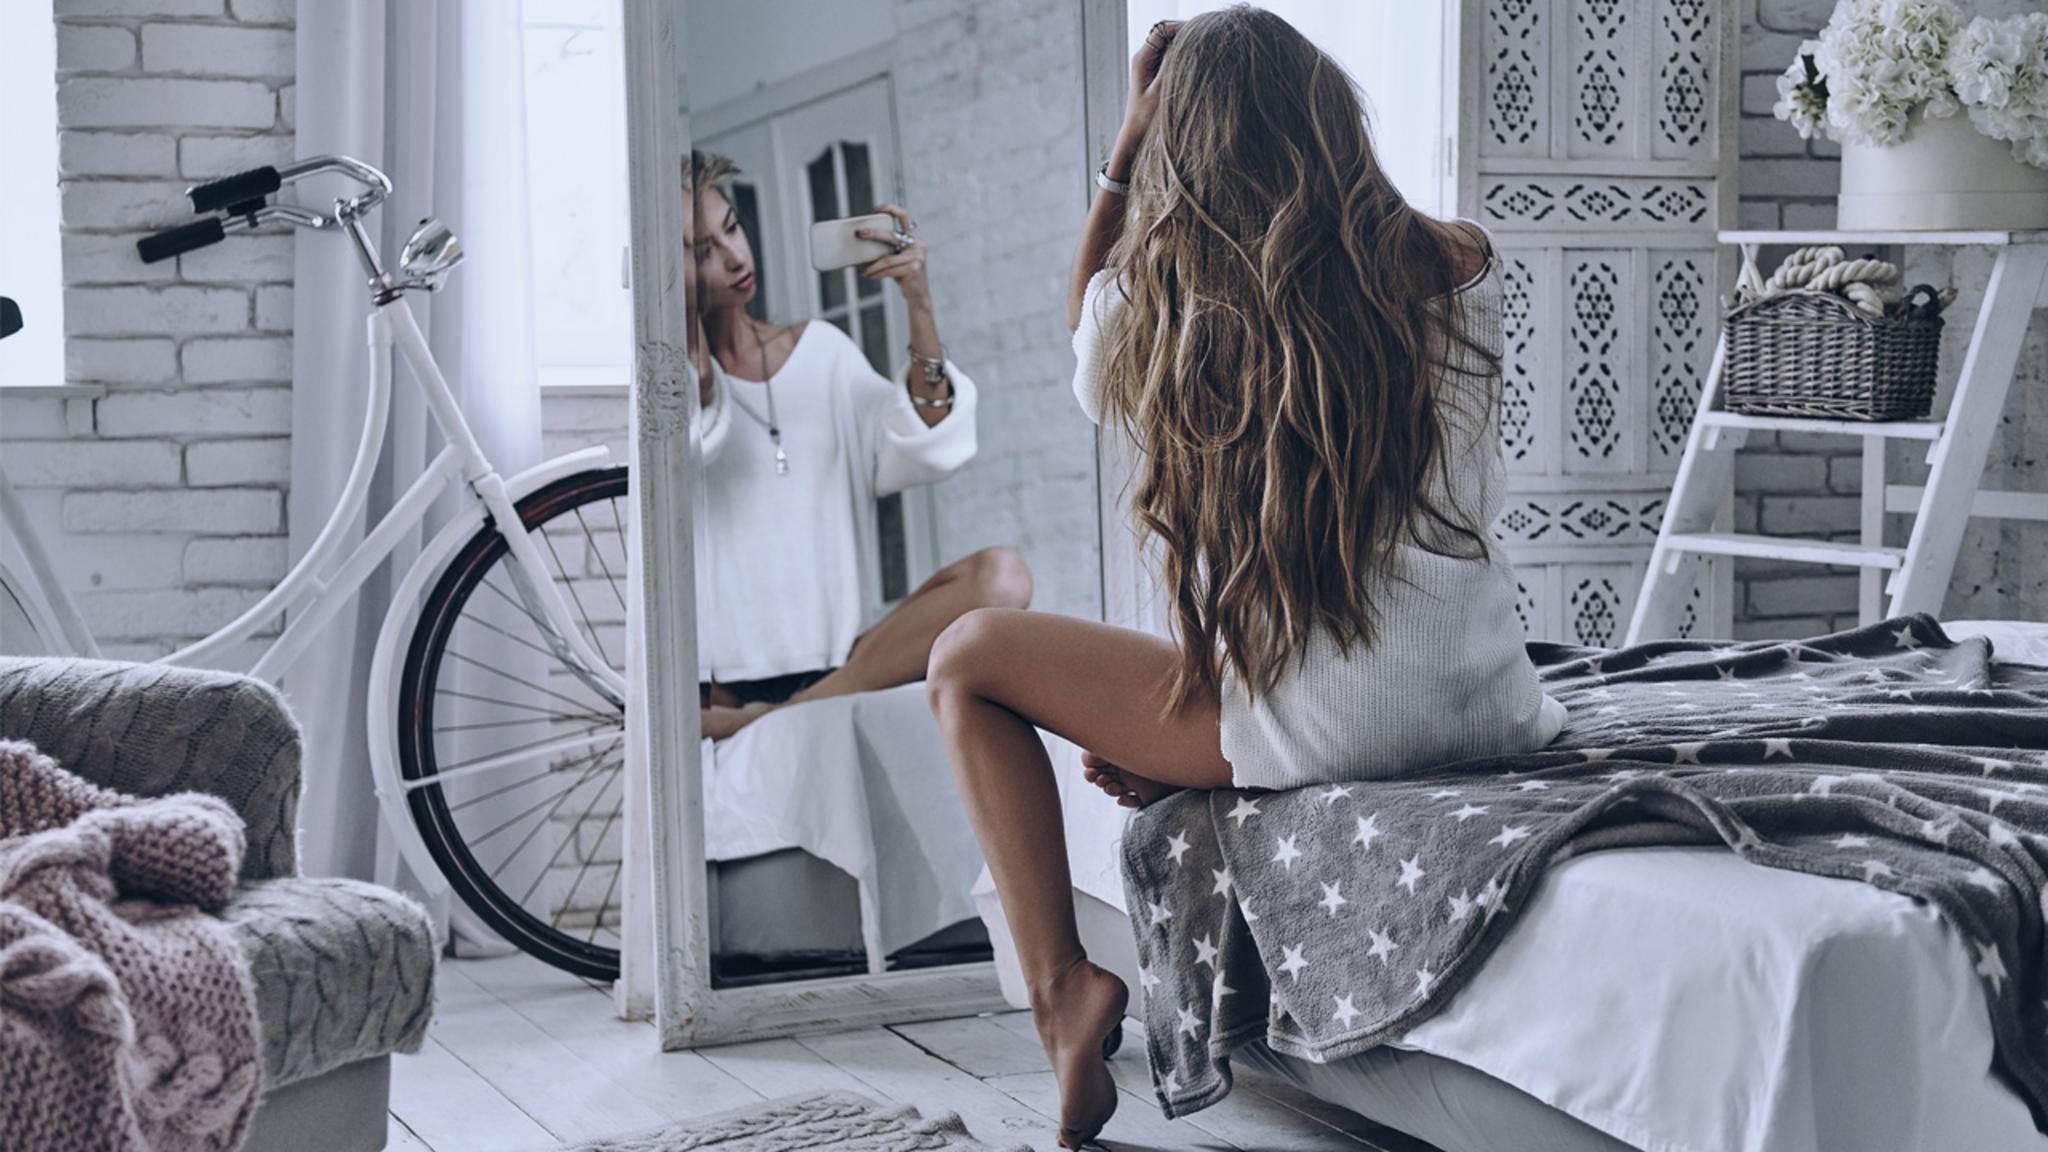 Pic girls spiegel selbst nackt iphone